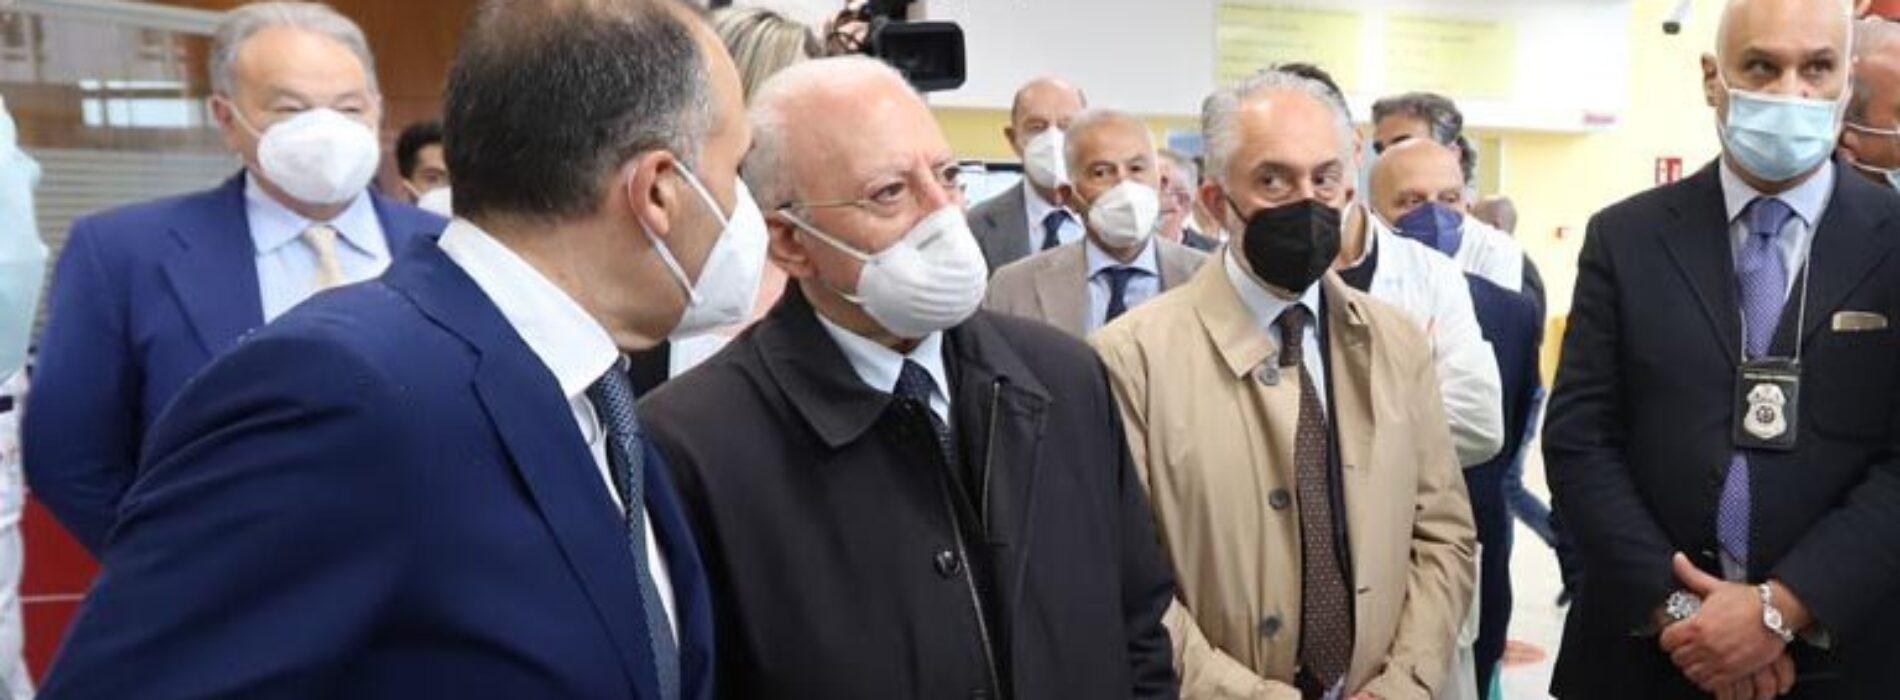 Emodinamica, De Luca a Caserta inaugura una nuova sala